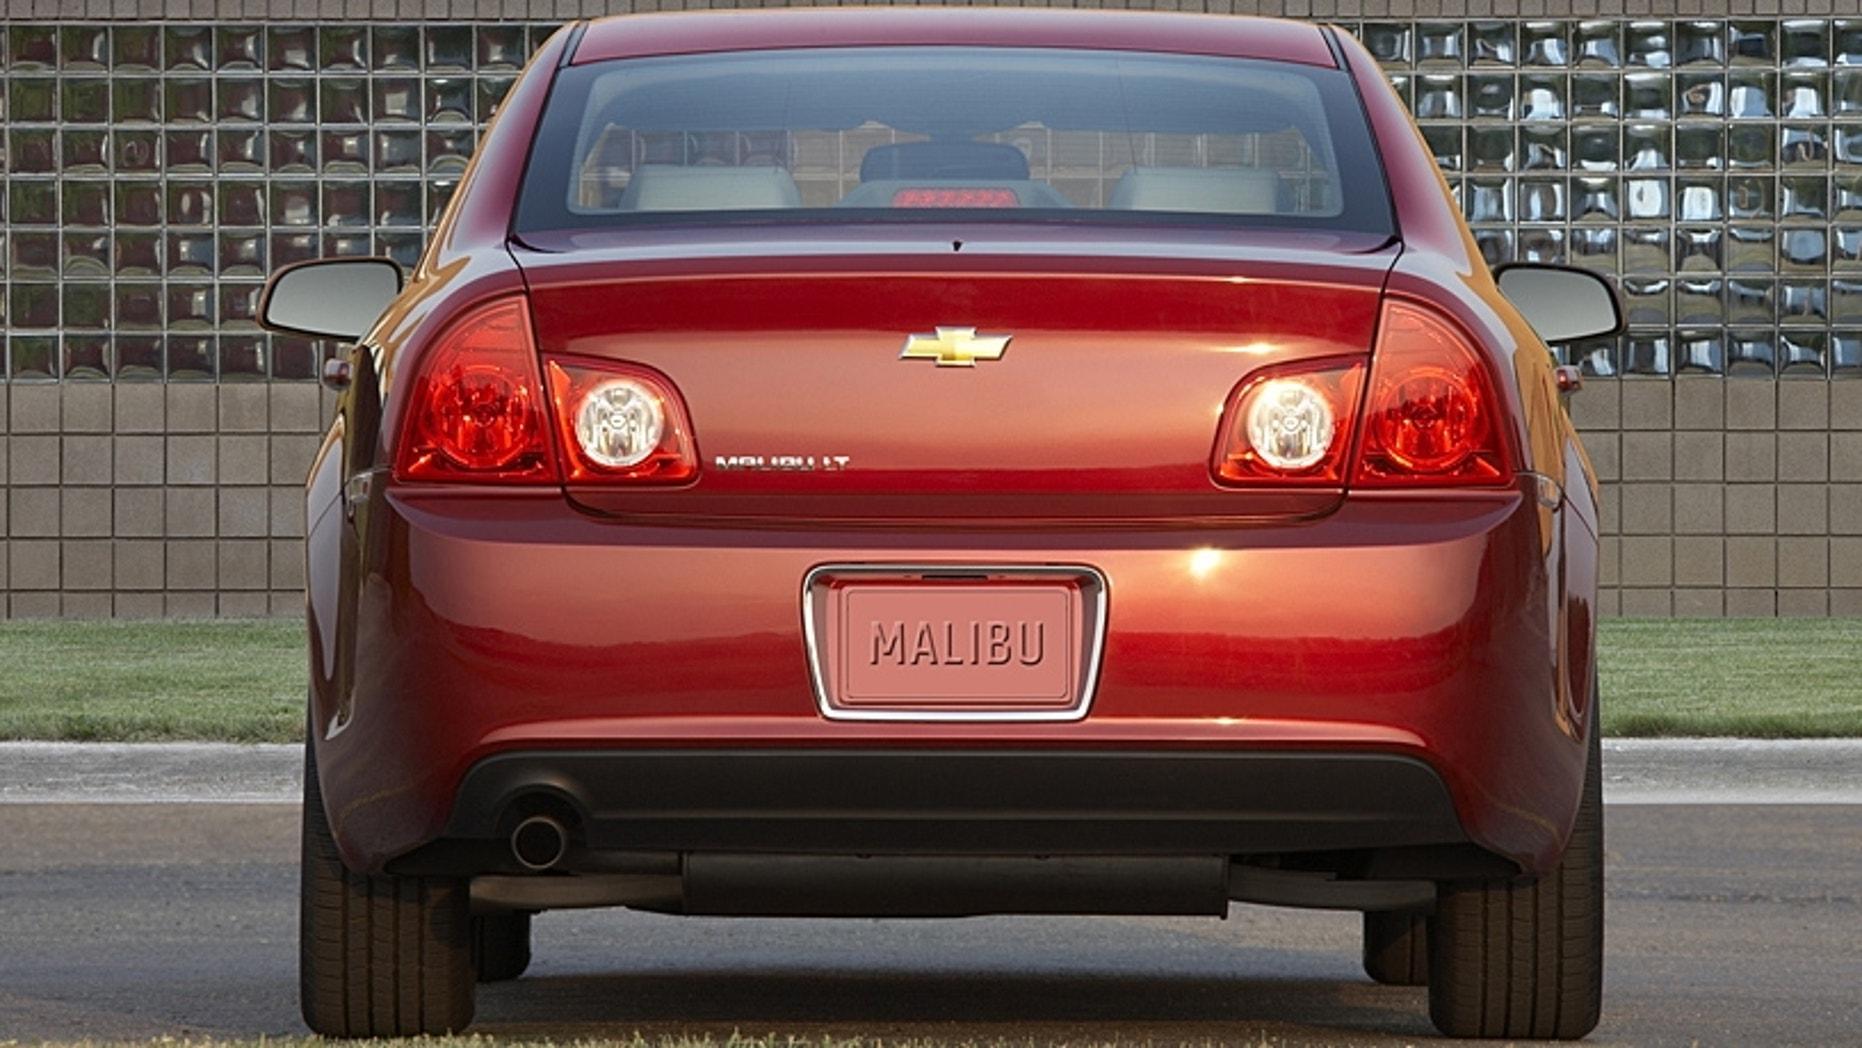 2011 Chevrolet Malibu LT. X11CH_MA008 (06/22/2010)  (United States)